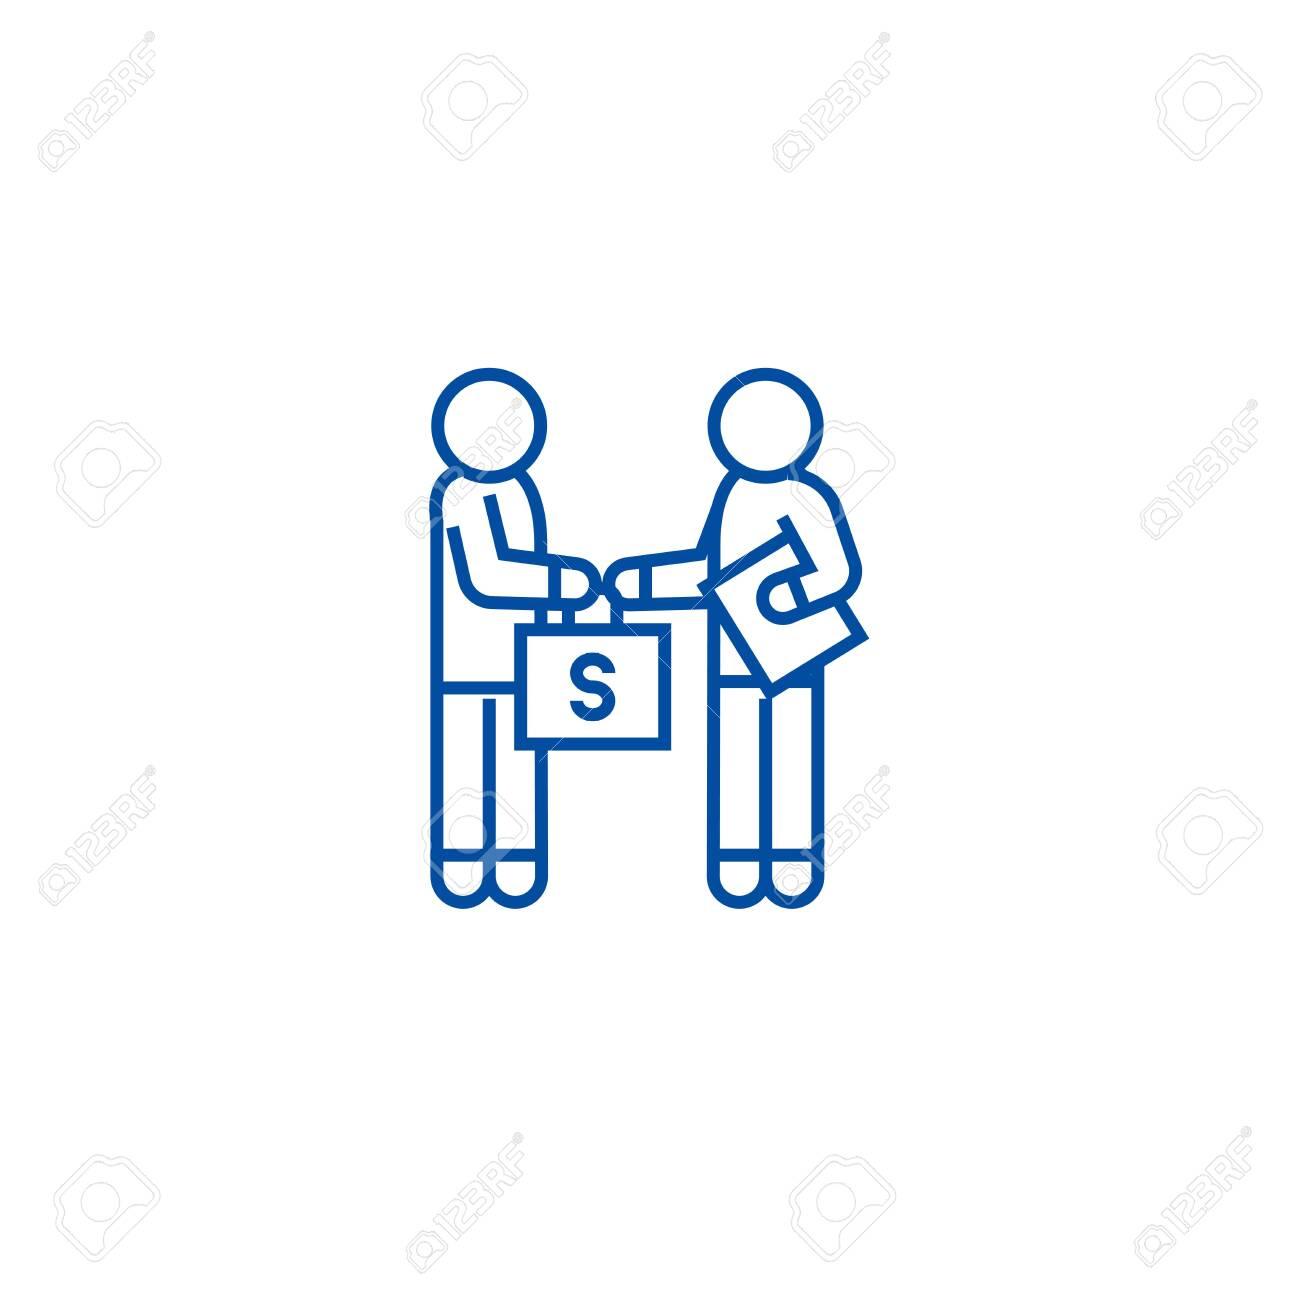 Bribery and corruption, man giving money line concept icon. Bribery and corruption, man giving money flat vector website sign, outline symbol, illustration. - 119711102